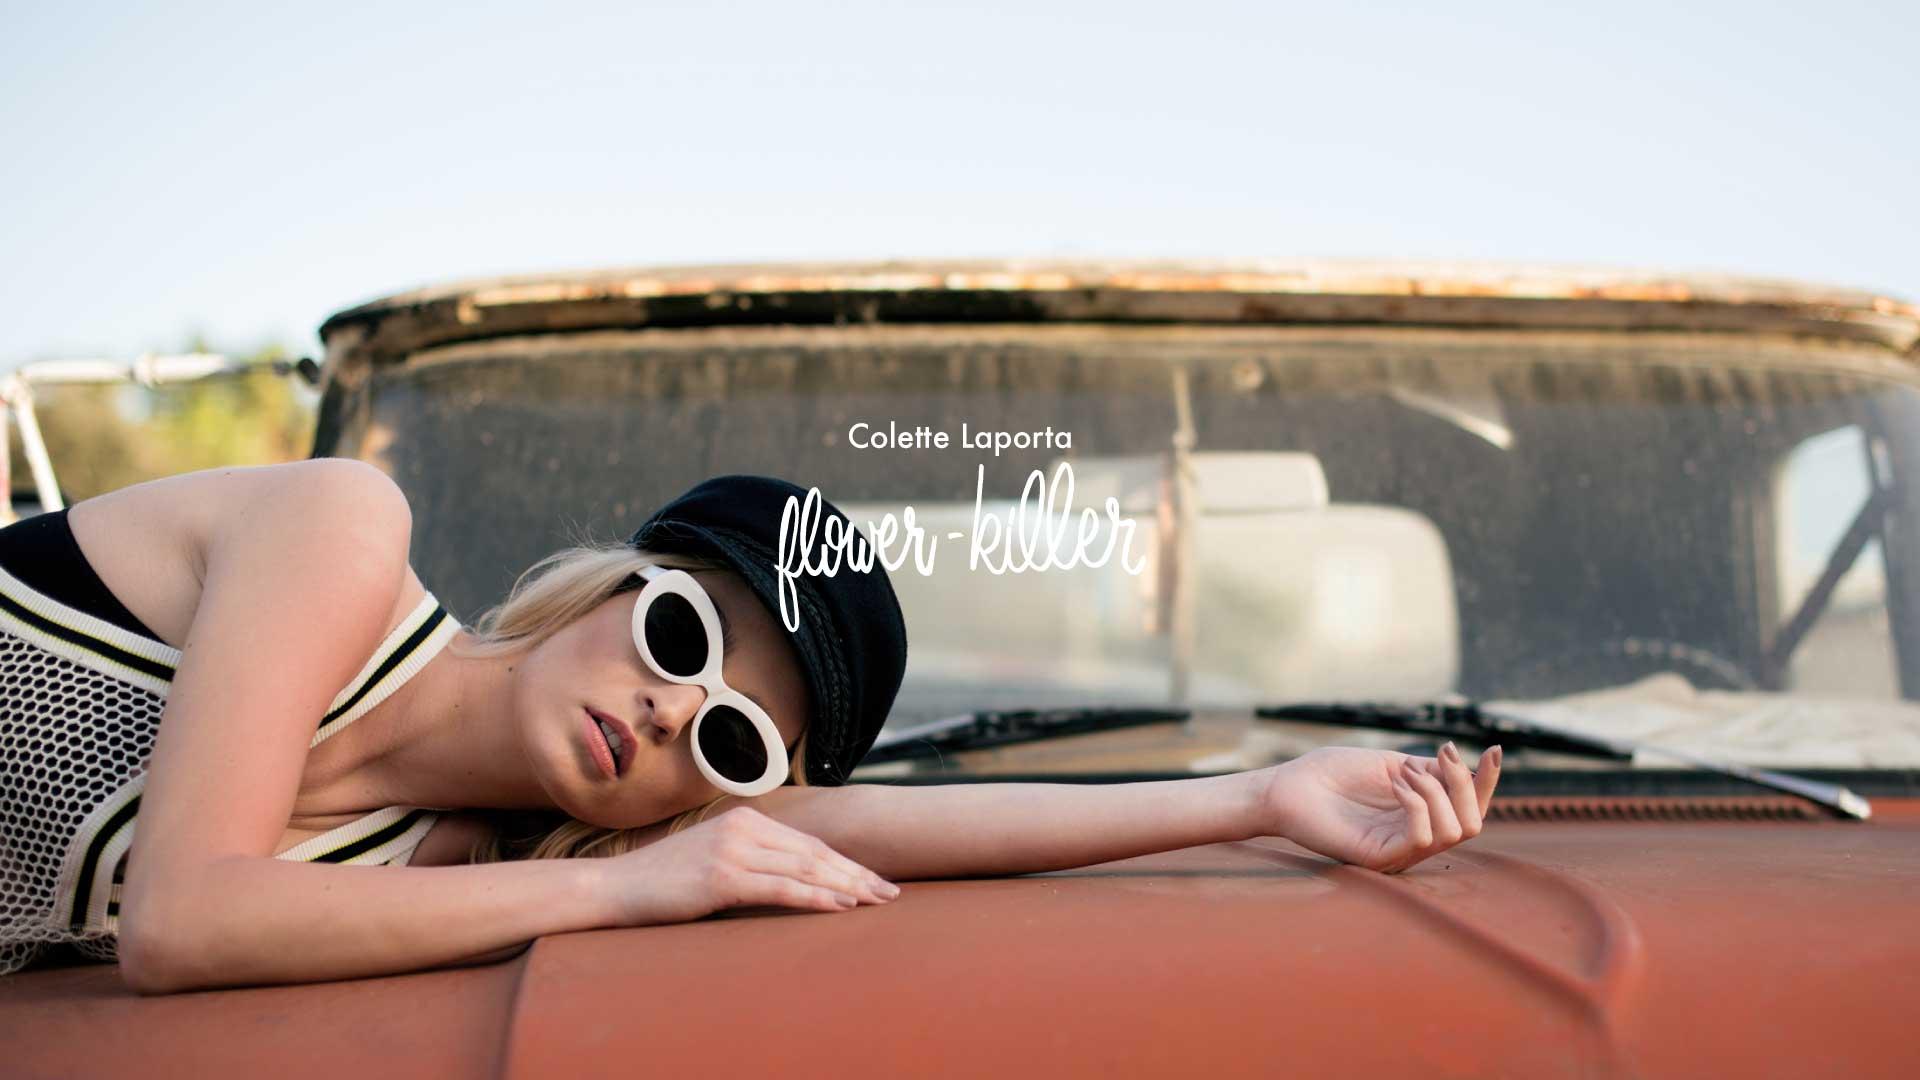 Leaked Colette Laporta naked (72 photos), Topless, Paparazzi, Boobs, braless 2015